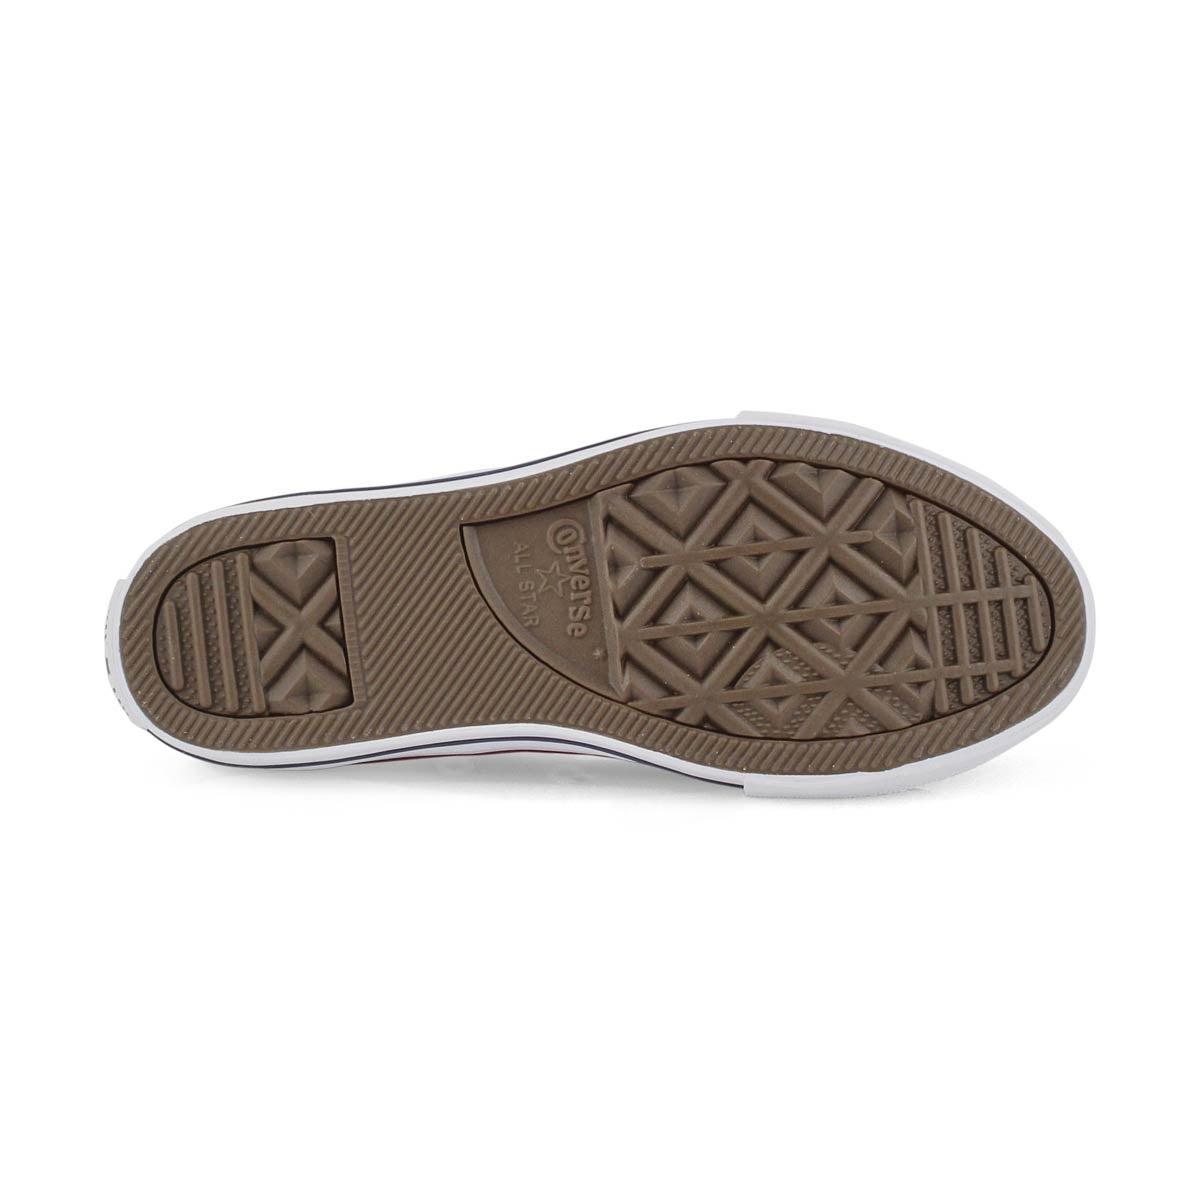 Grls CTAS Seasonal coast/garnet sneaker